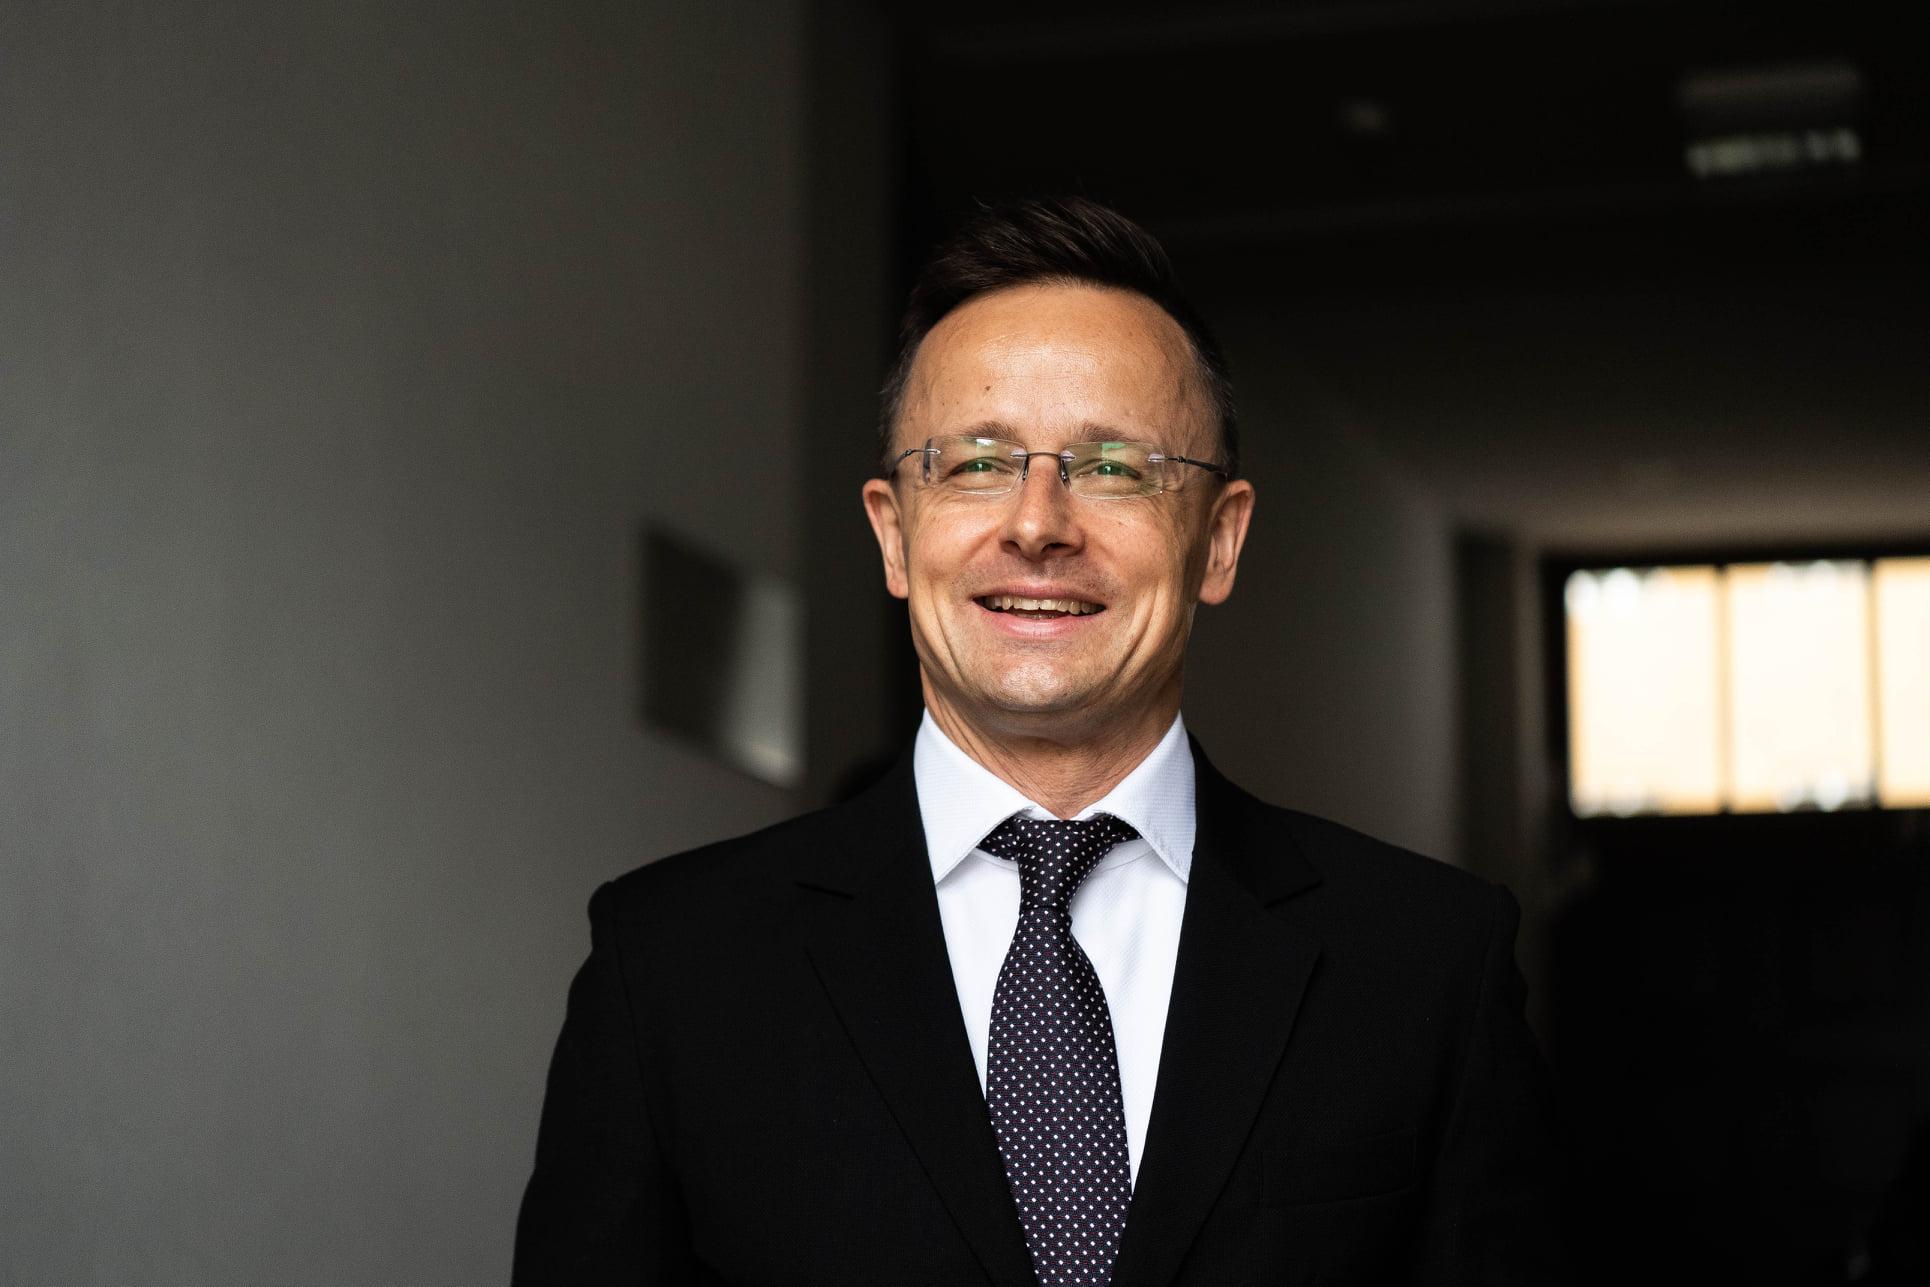 FM Szijjártó: Hungary Pandemic Response Most Successful in Europe